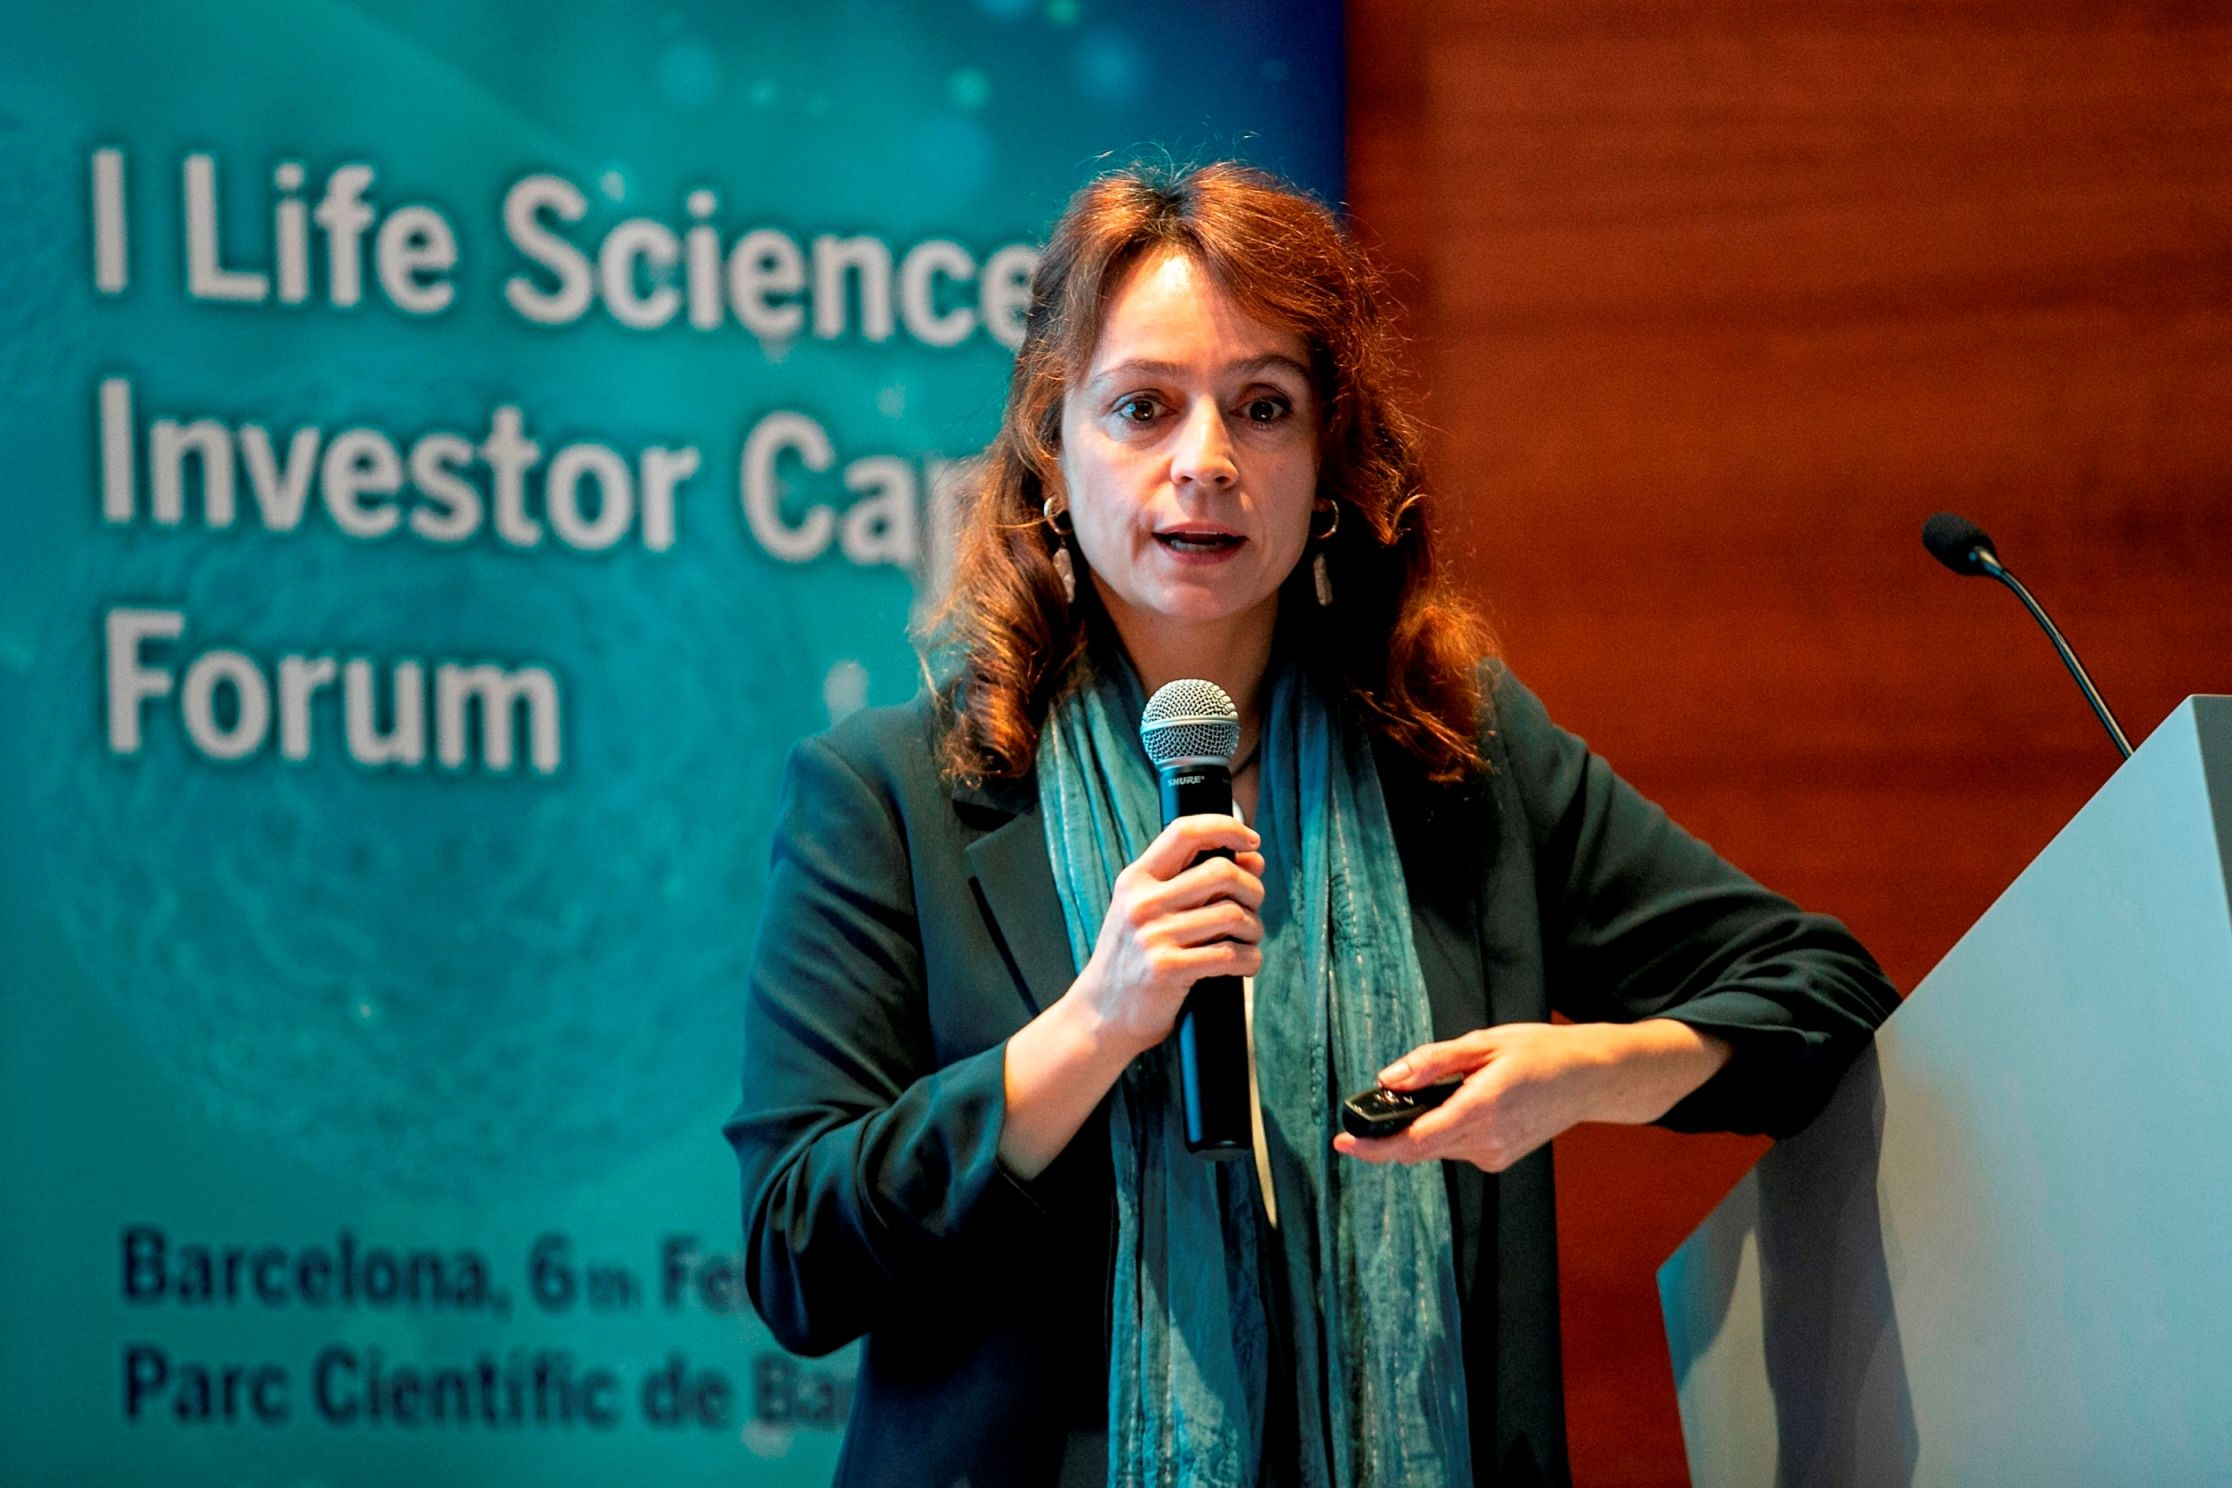 Once Start-Ups de Life Sciences exponen sus proyectos en un foro de inversores